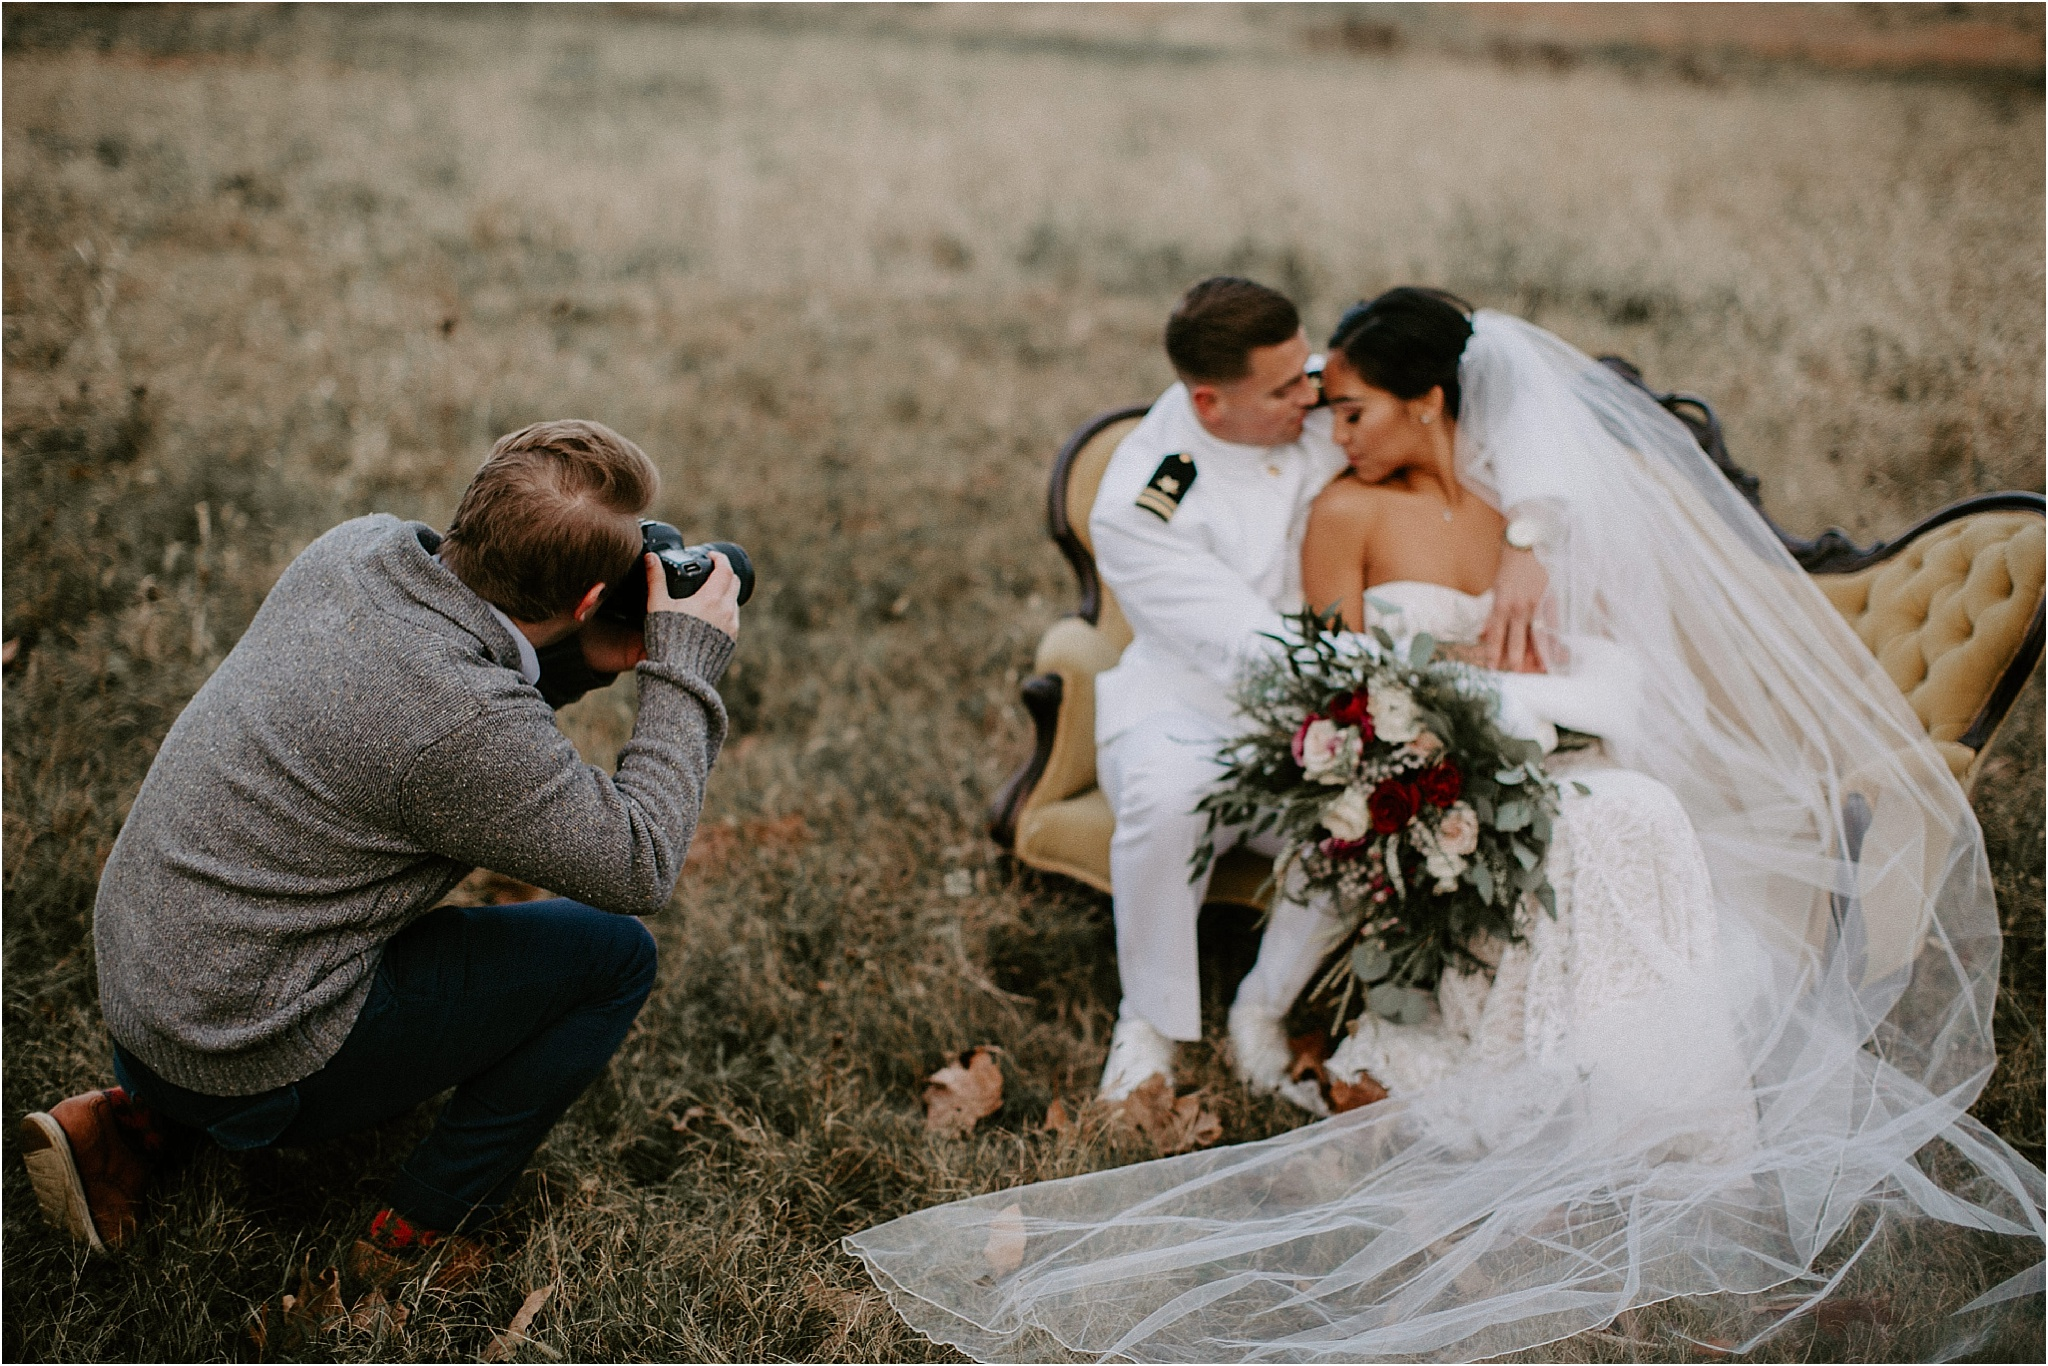 Sarah_Brookhart_PA_MD_Wedding_Photographer_0013.jpg